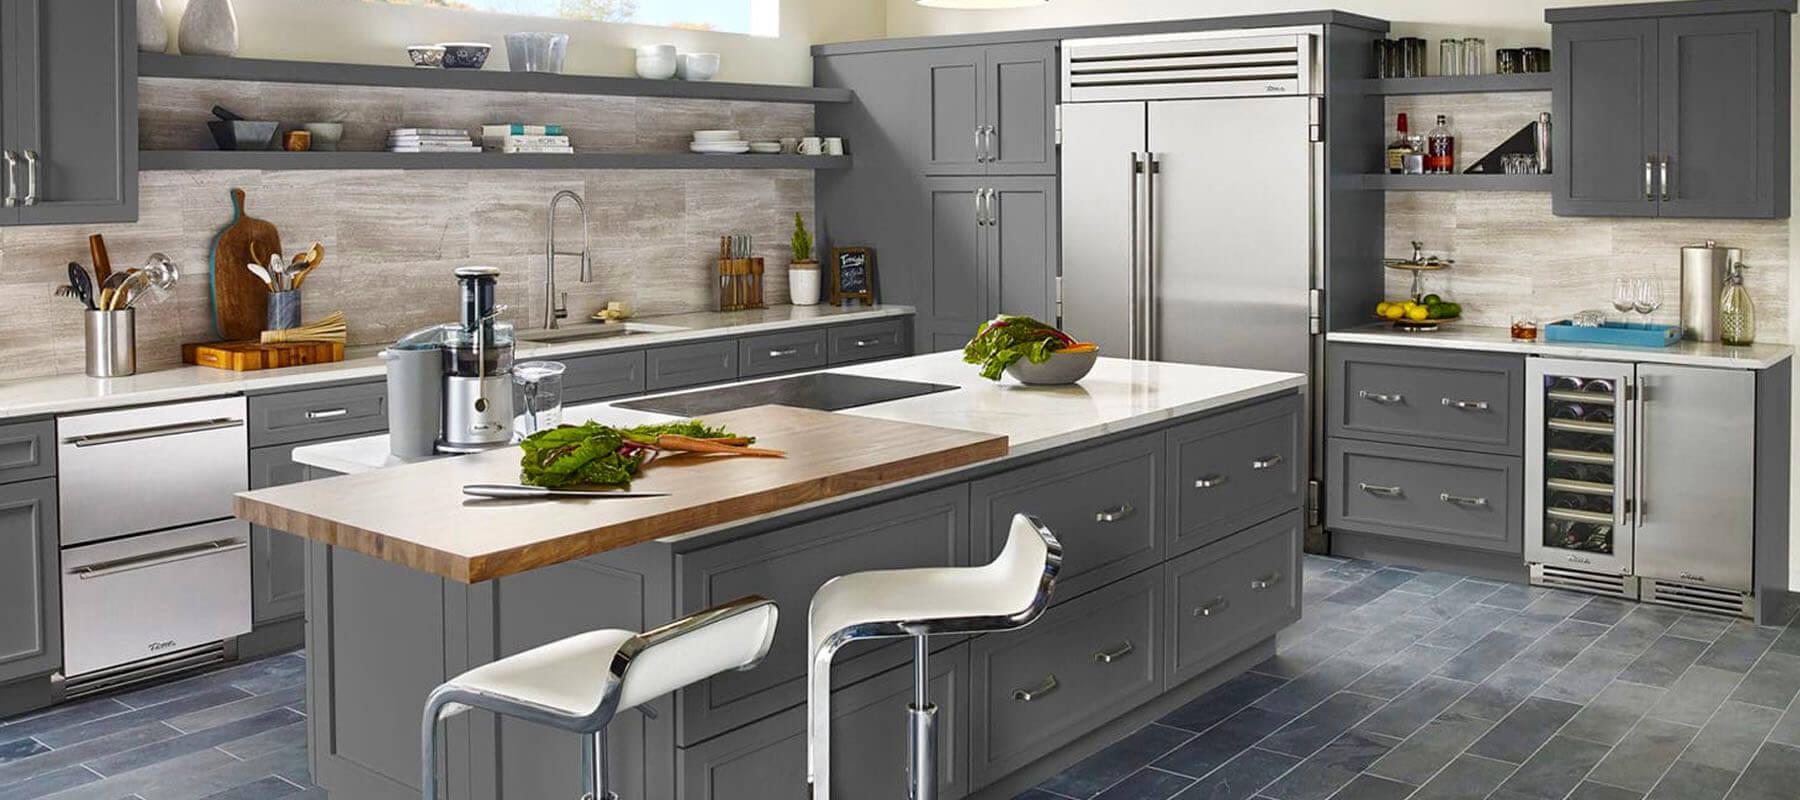 Built in Counter Depth Refrigerator Pacific Palisades | Built-in Refrigerator Repair